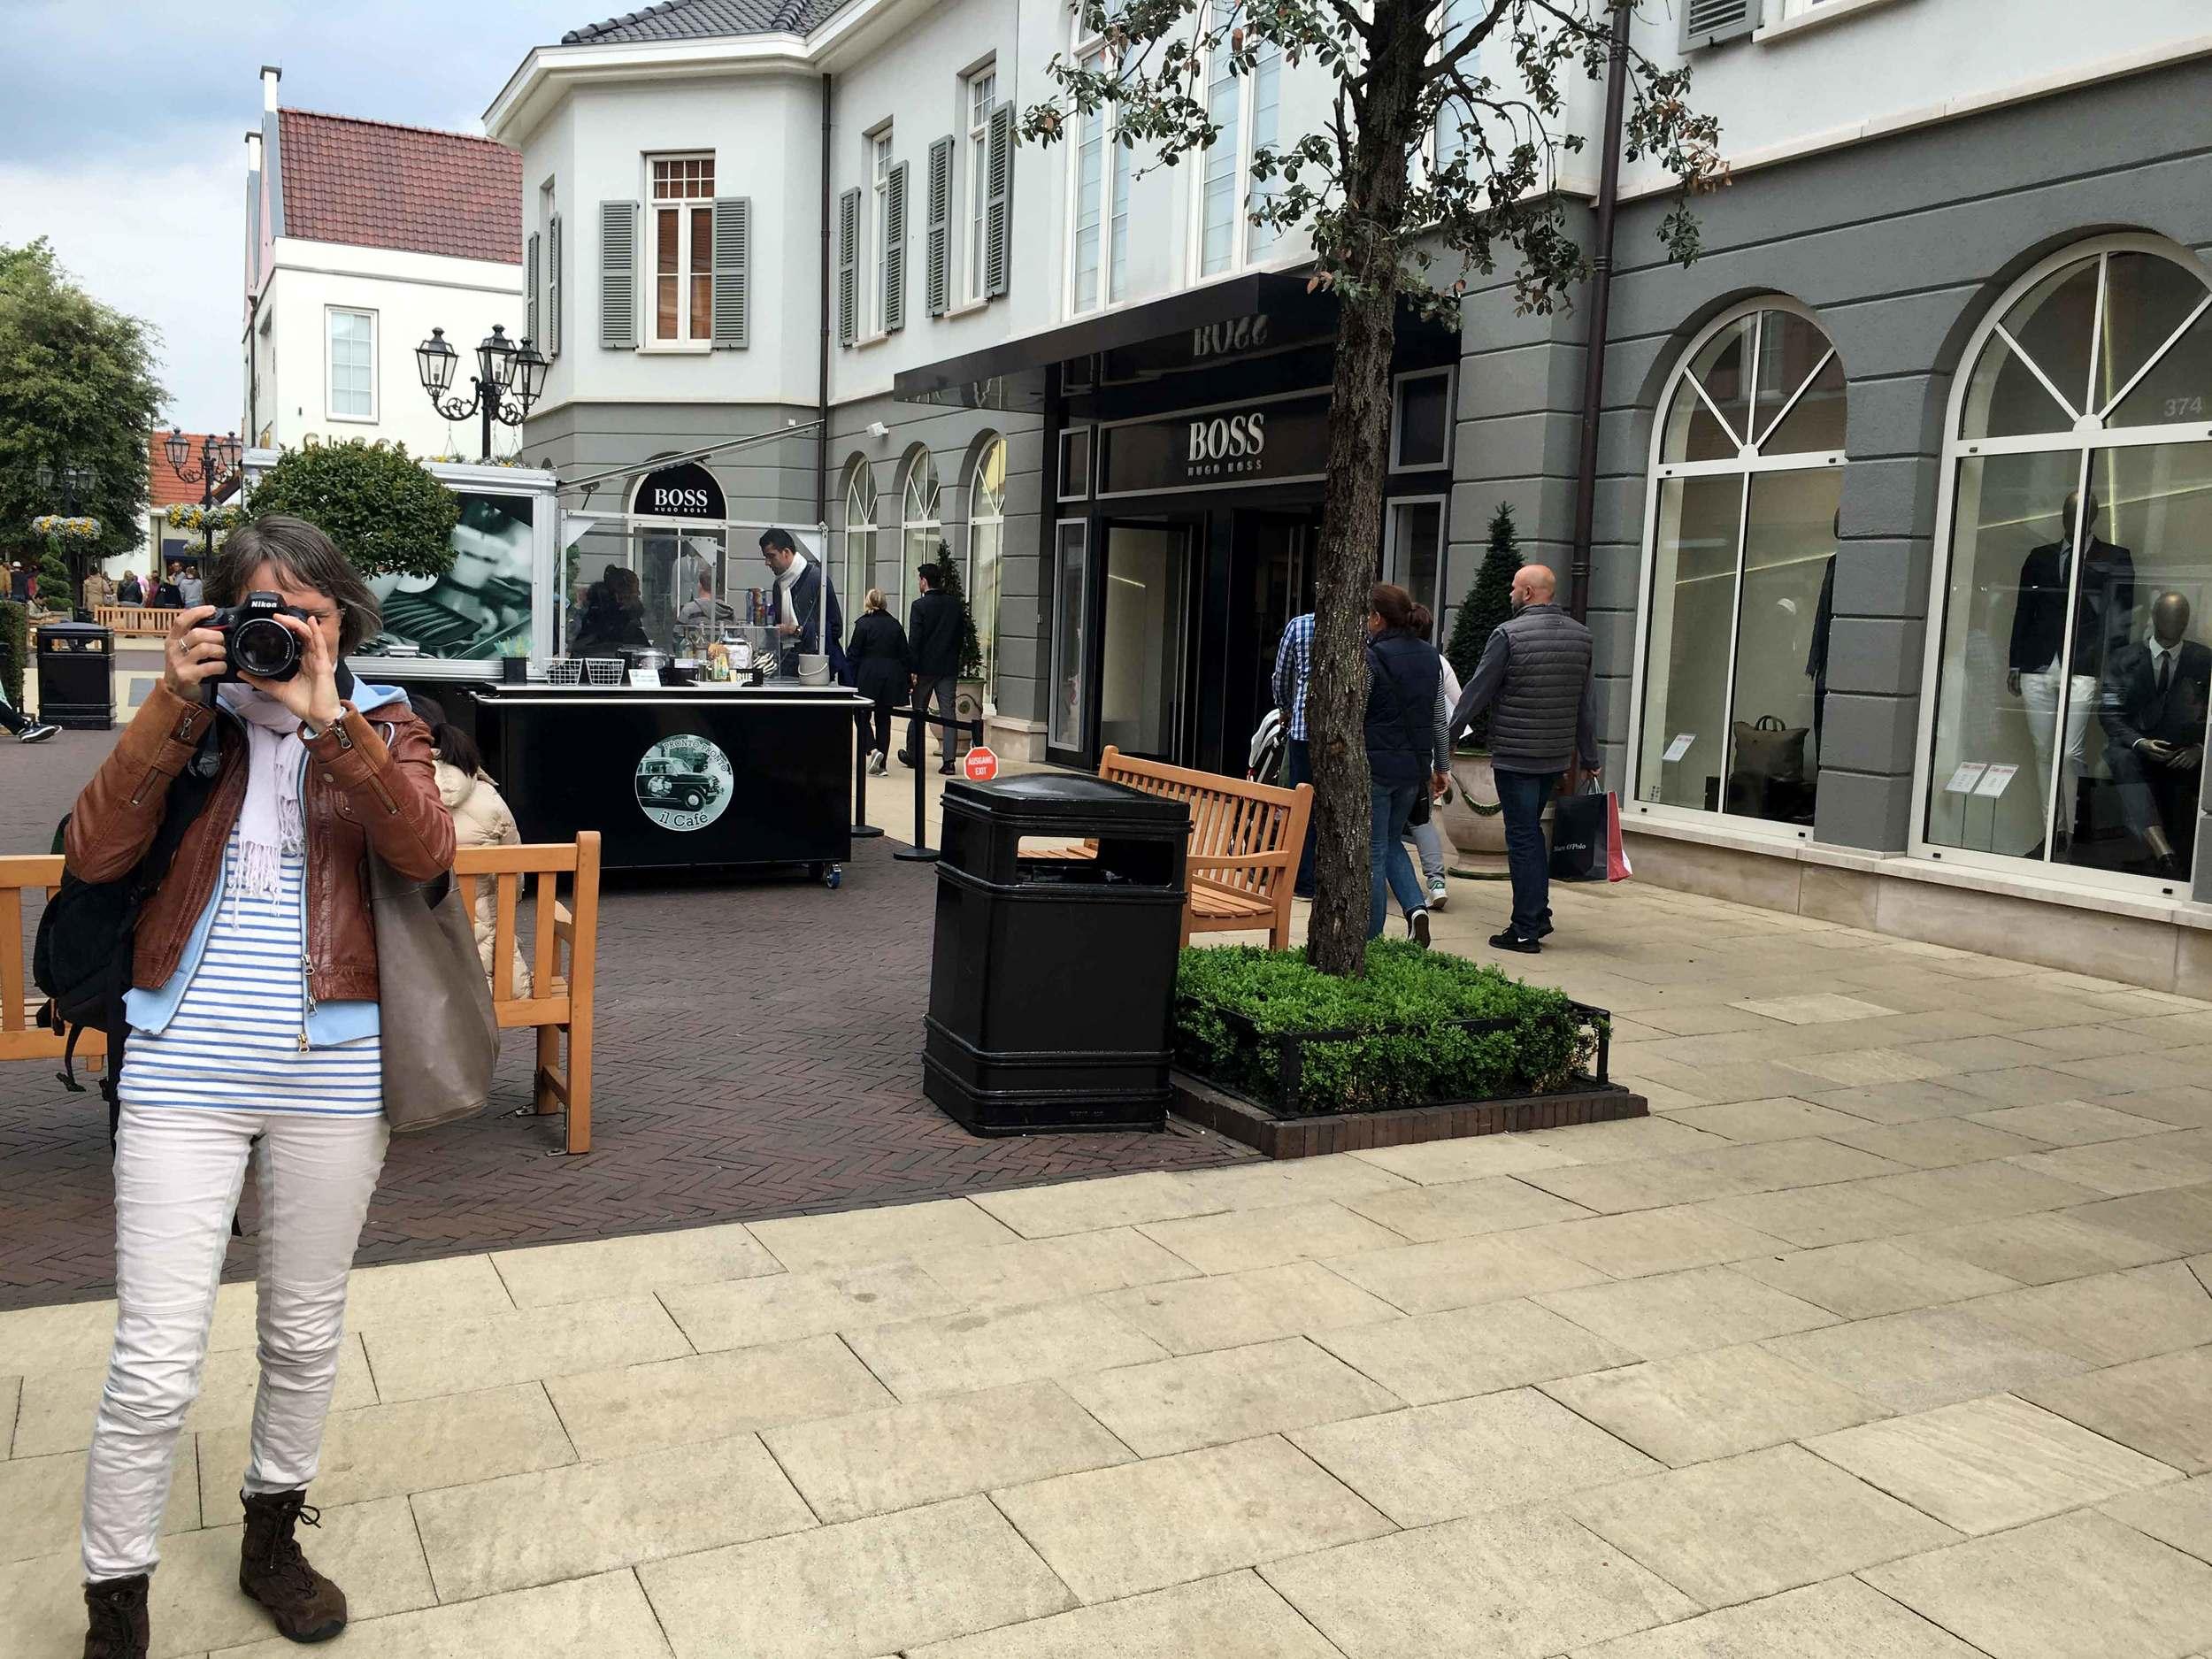 My friend Nicola, the photographer! Designer Outlet Roermond, Netherlands. Photo: Gunjan Virk, image©sourcingstyle.com